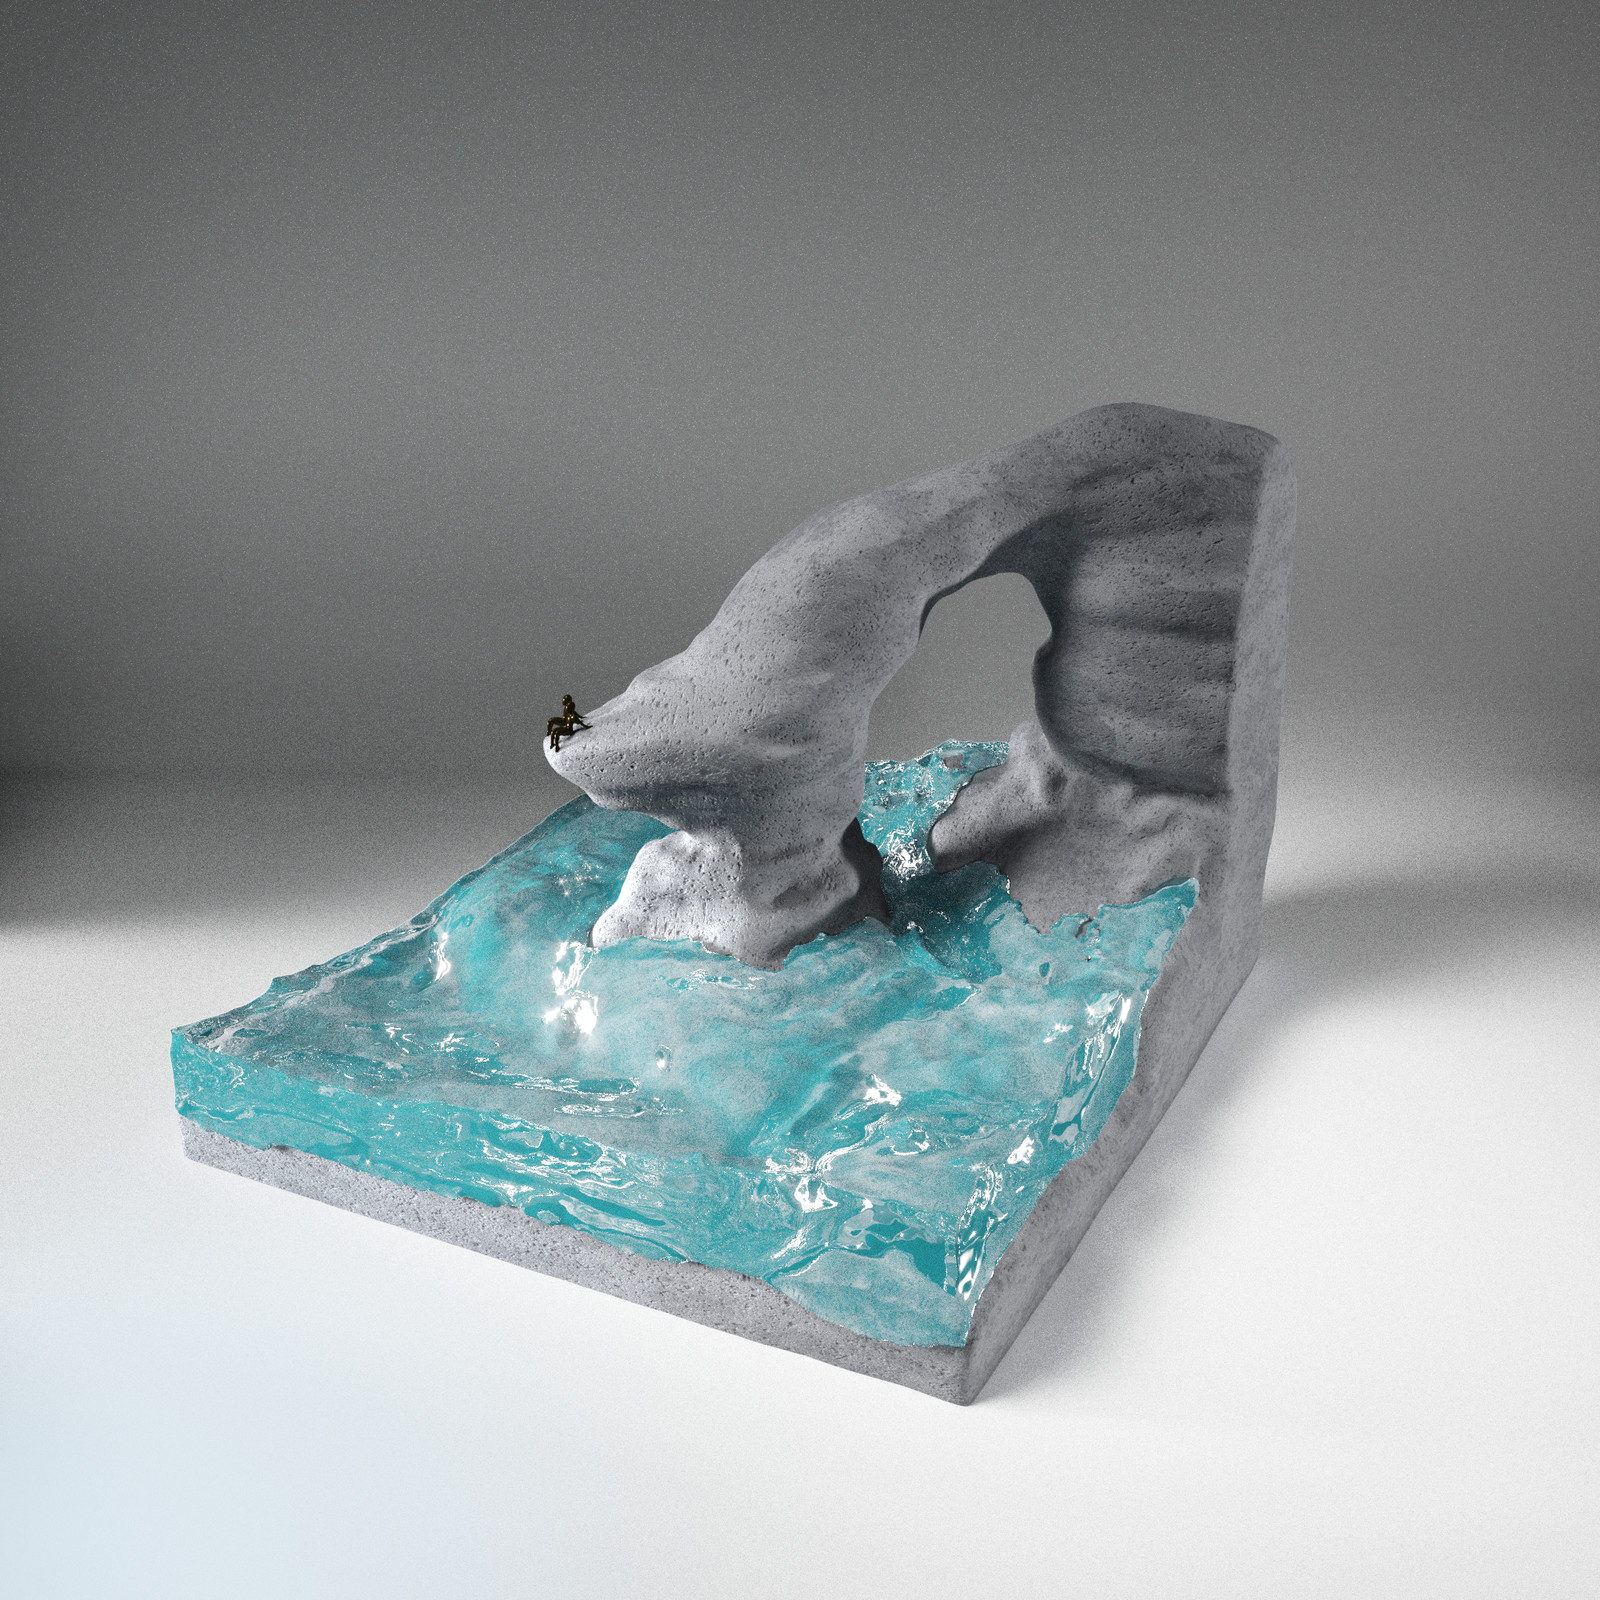 Ben Young Sculpture Study